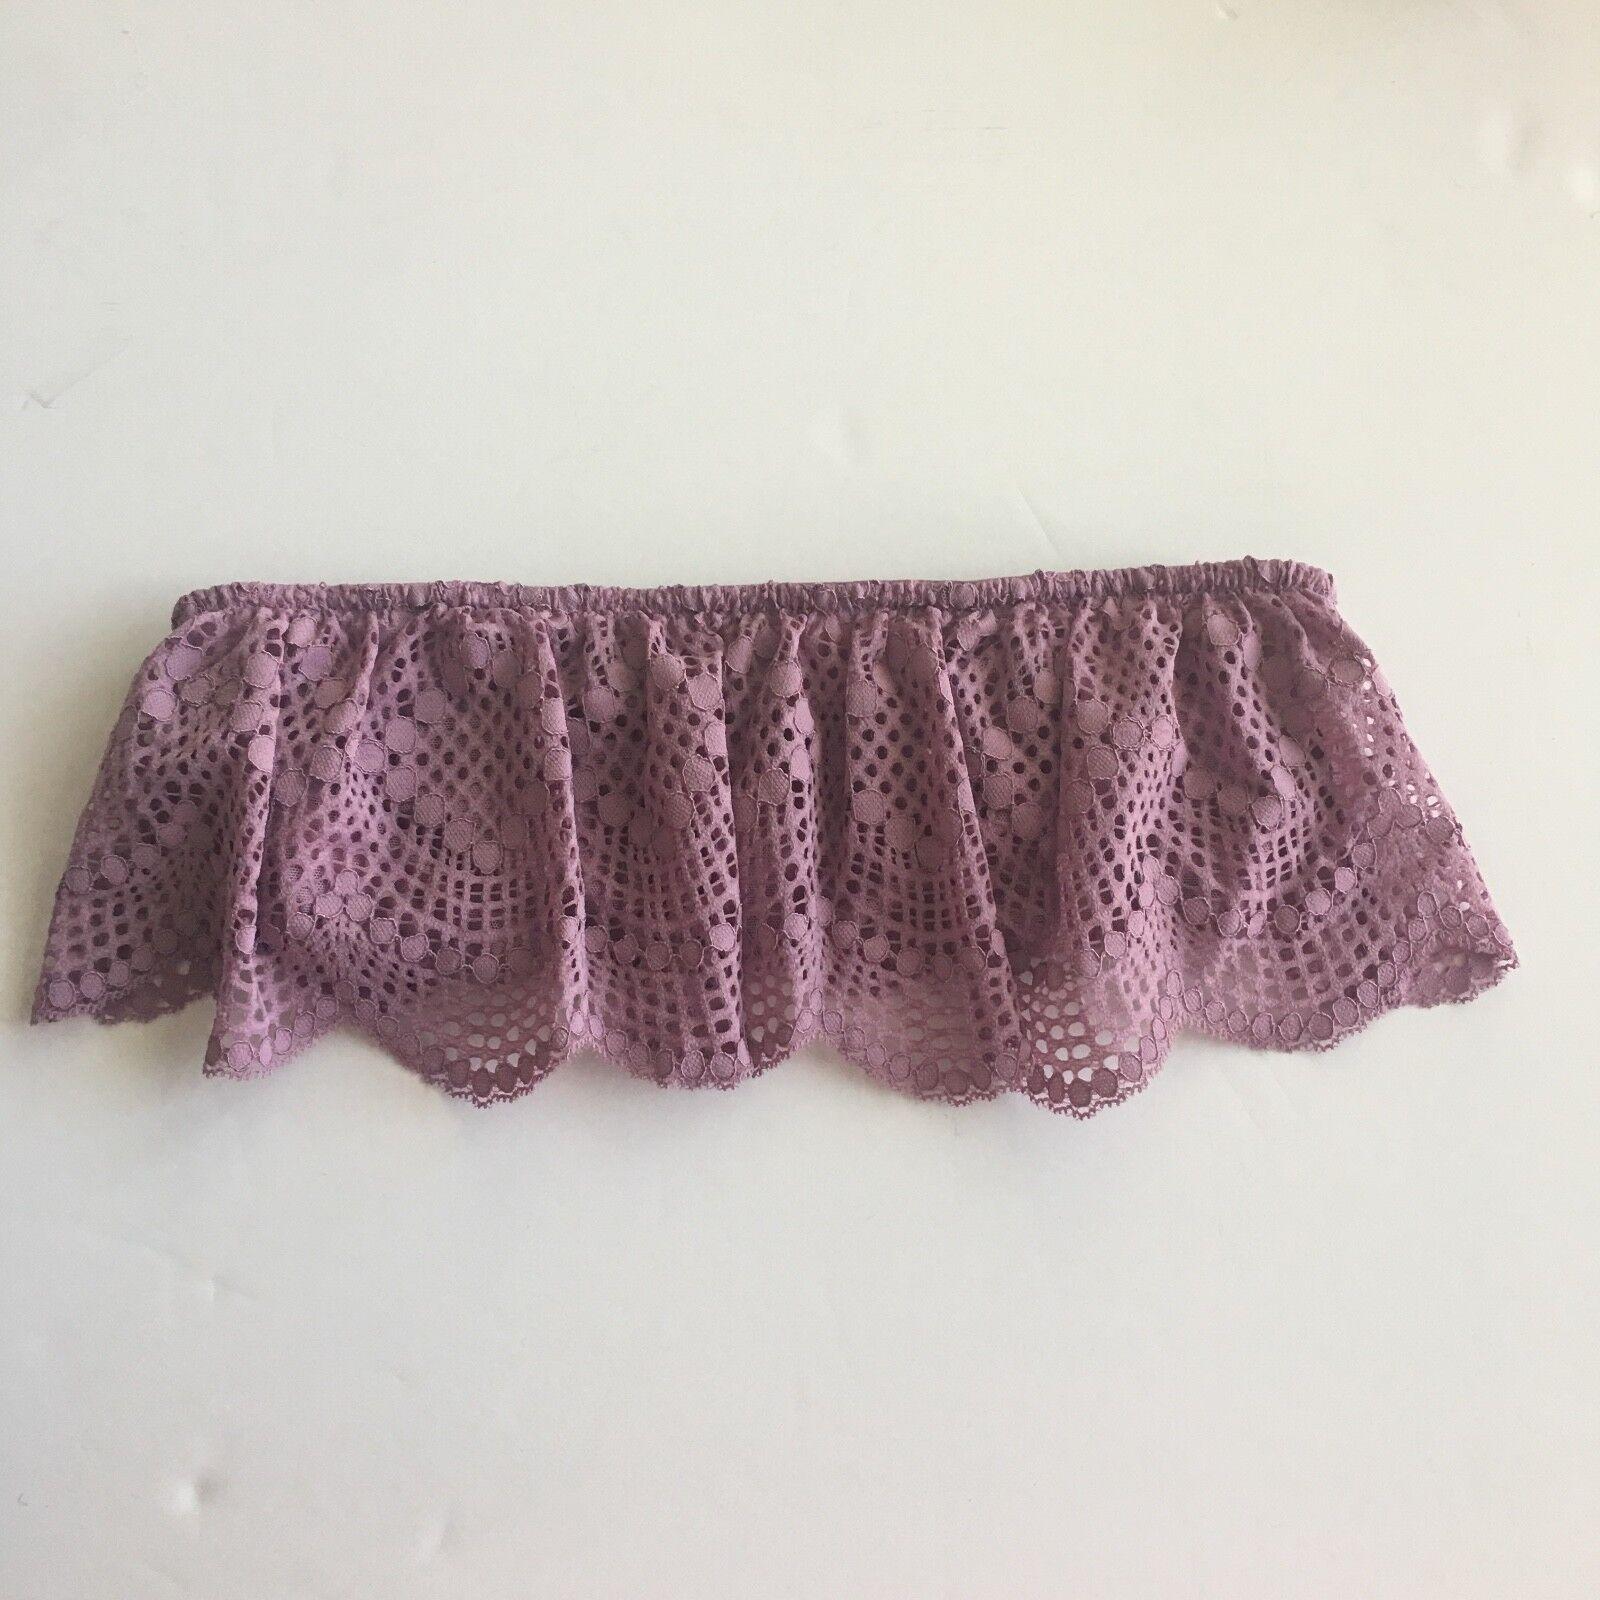 Victoria's Secret Women's Lace Crochet Bralette Purple Bra Size S